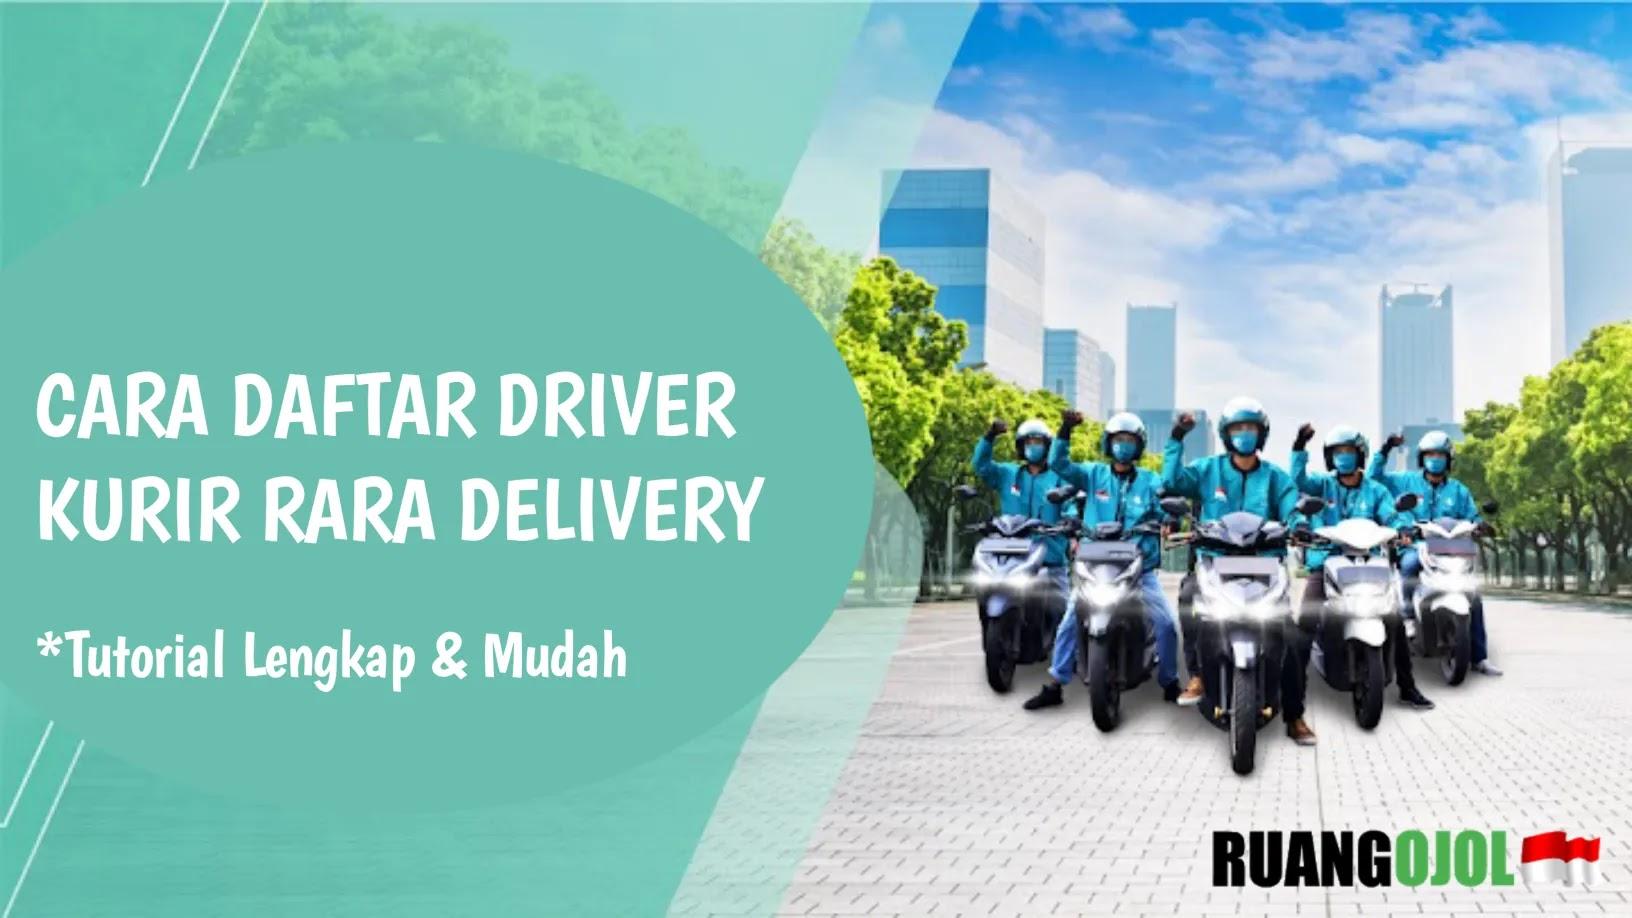 Cara Daftar Driver Kurir Rara Delivery | Syarat dan Ketentuan!